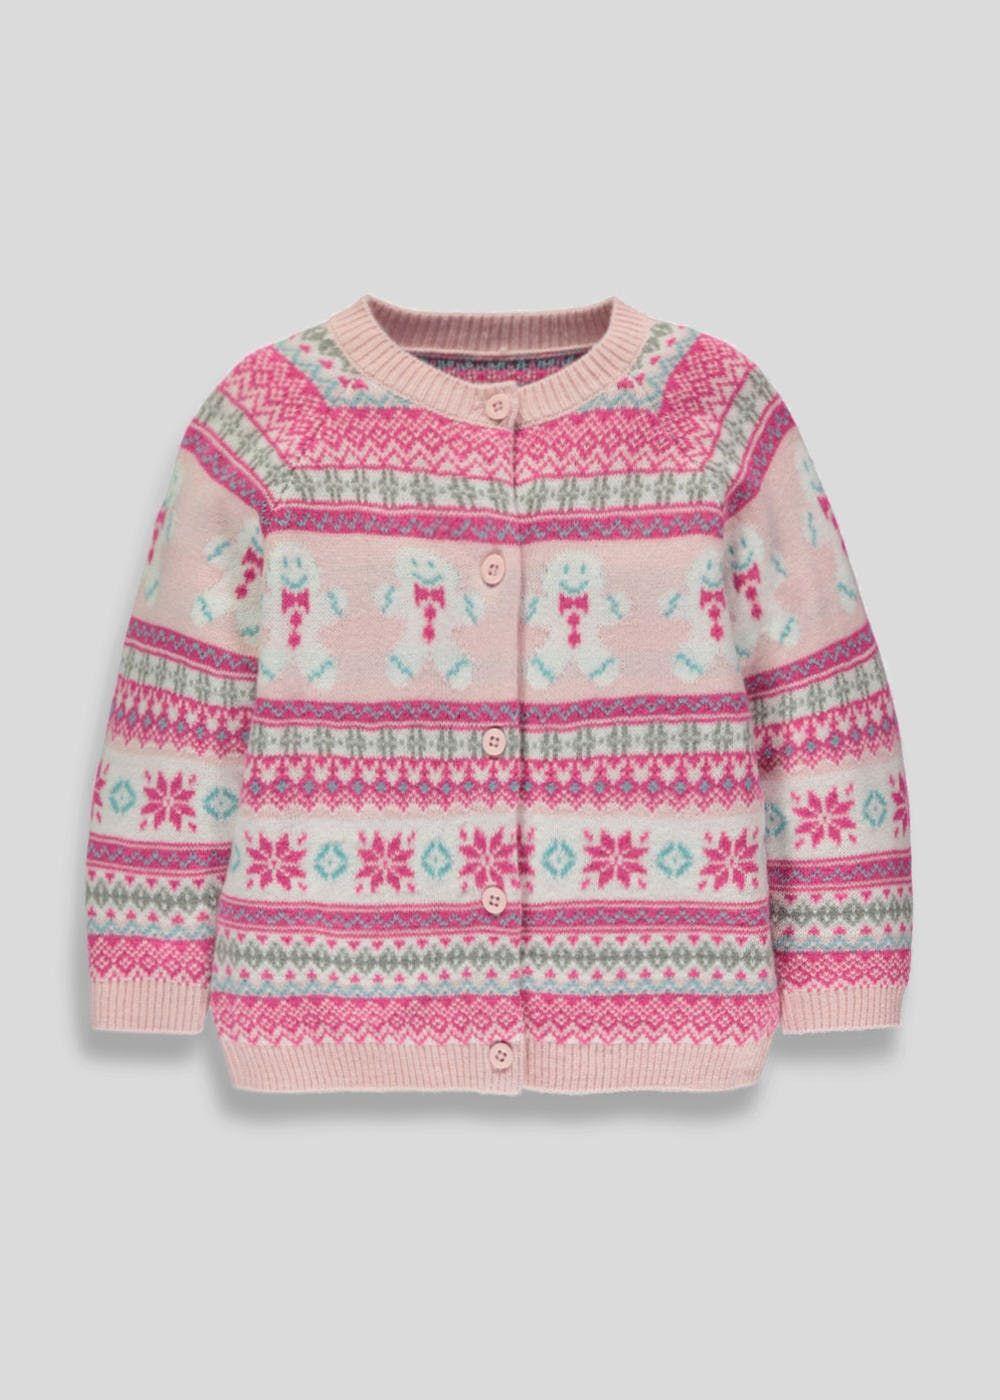 Baby pink dungaree dress  Girls Gingerbread Man Christmas Cardigan mthsyrs u Matalan